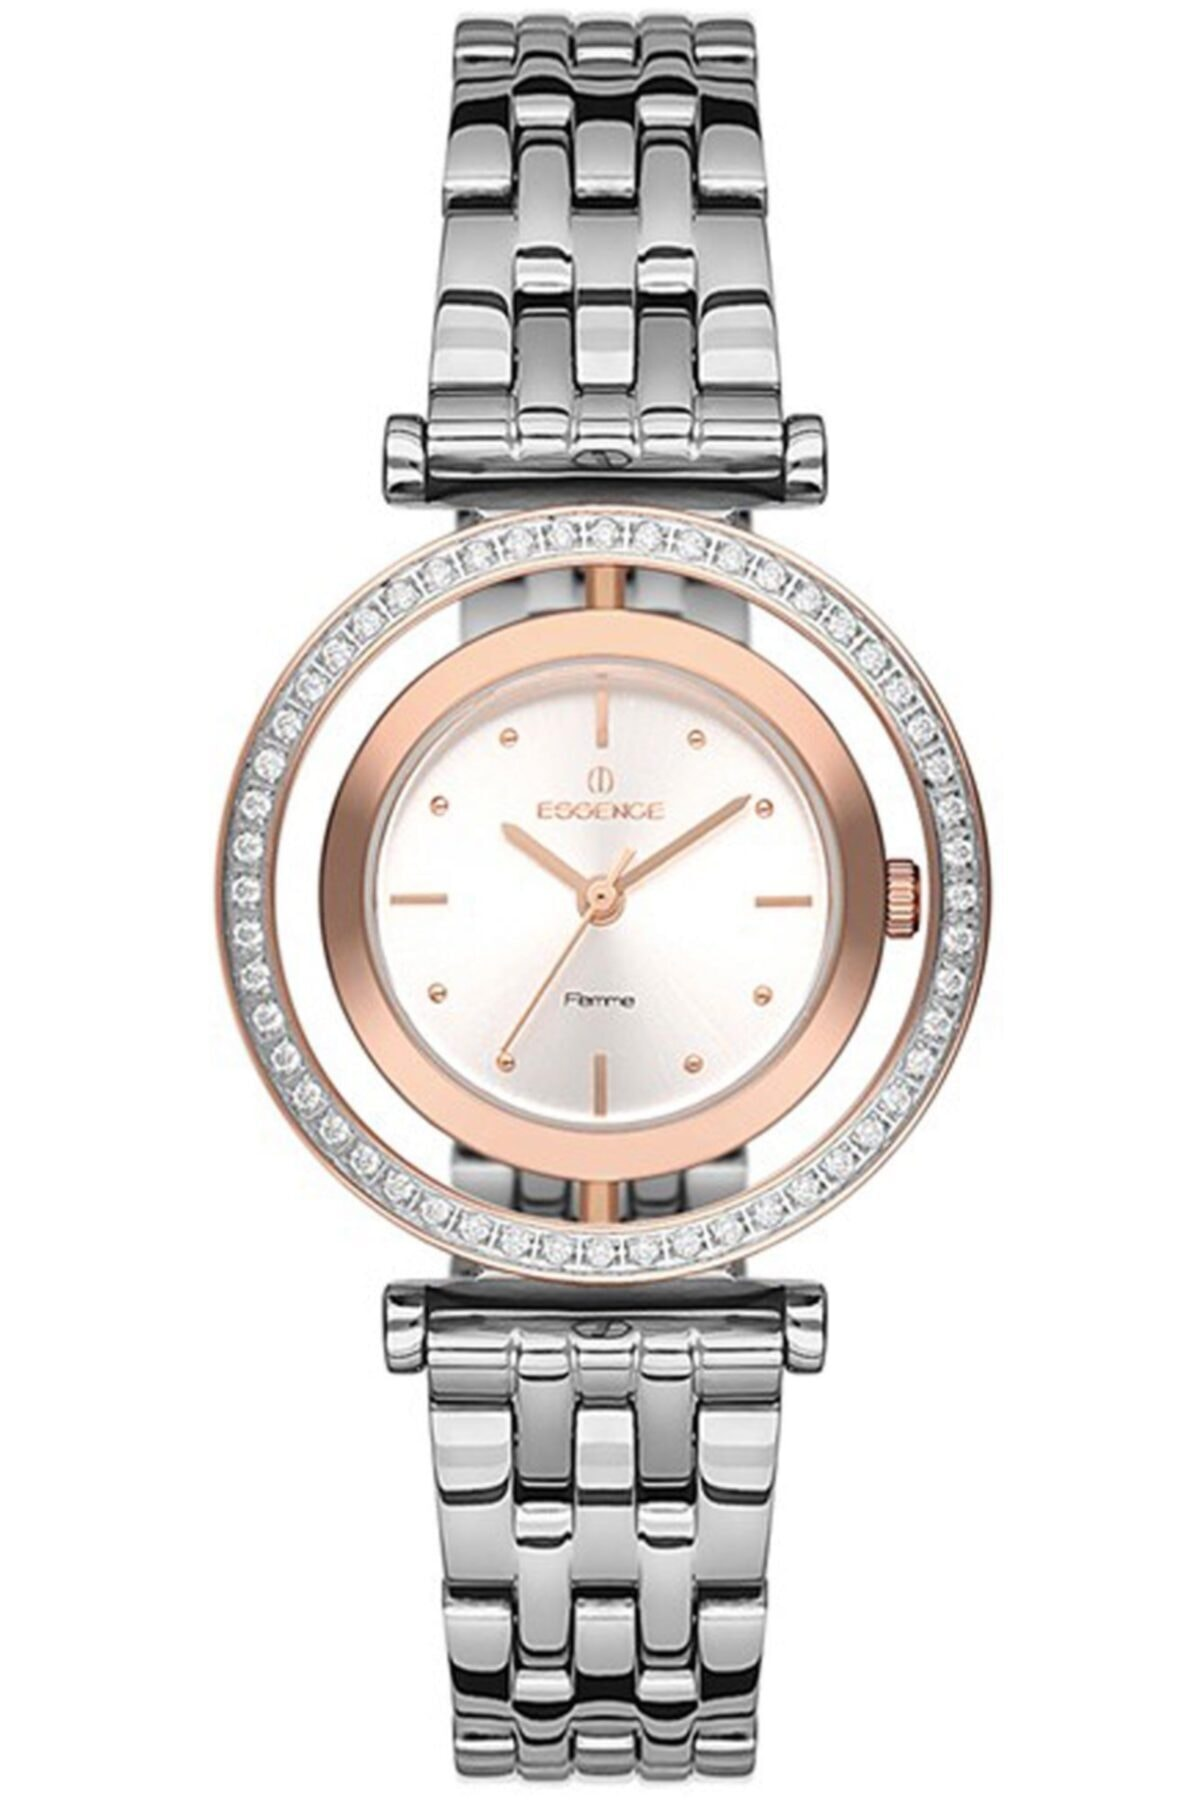 Essence Kadın Gümüş Kol Saati Es6488fe.520 1